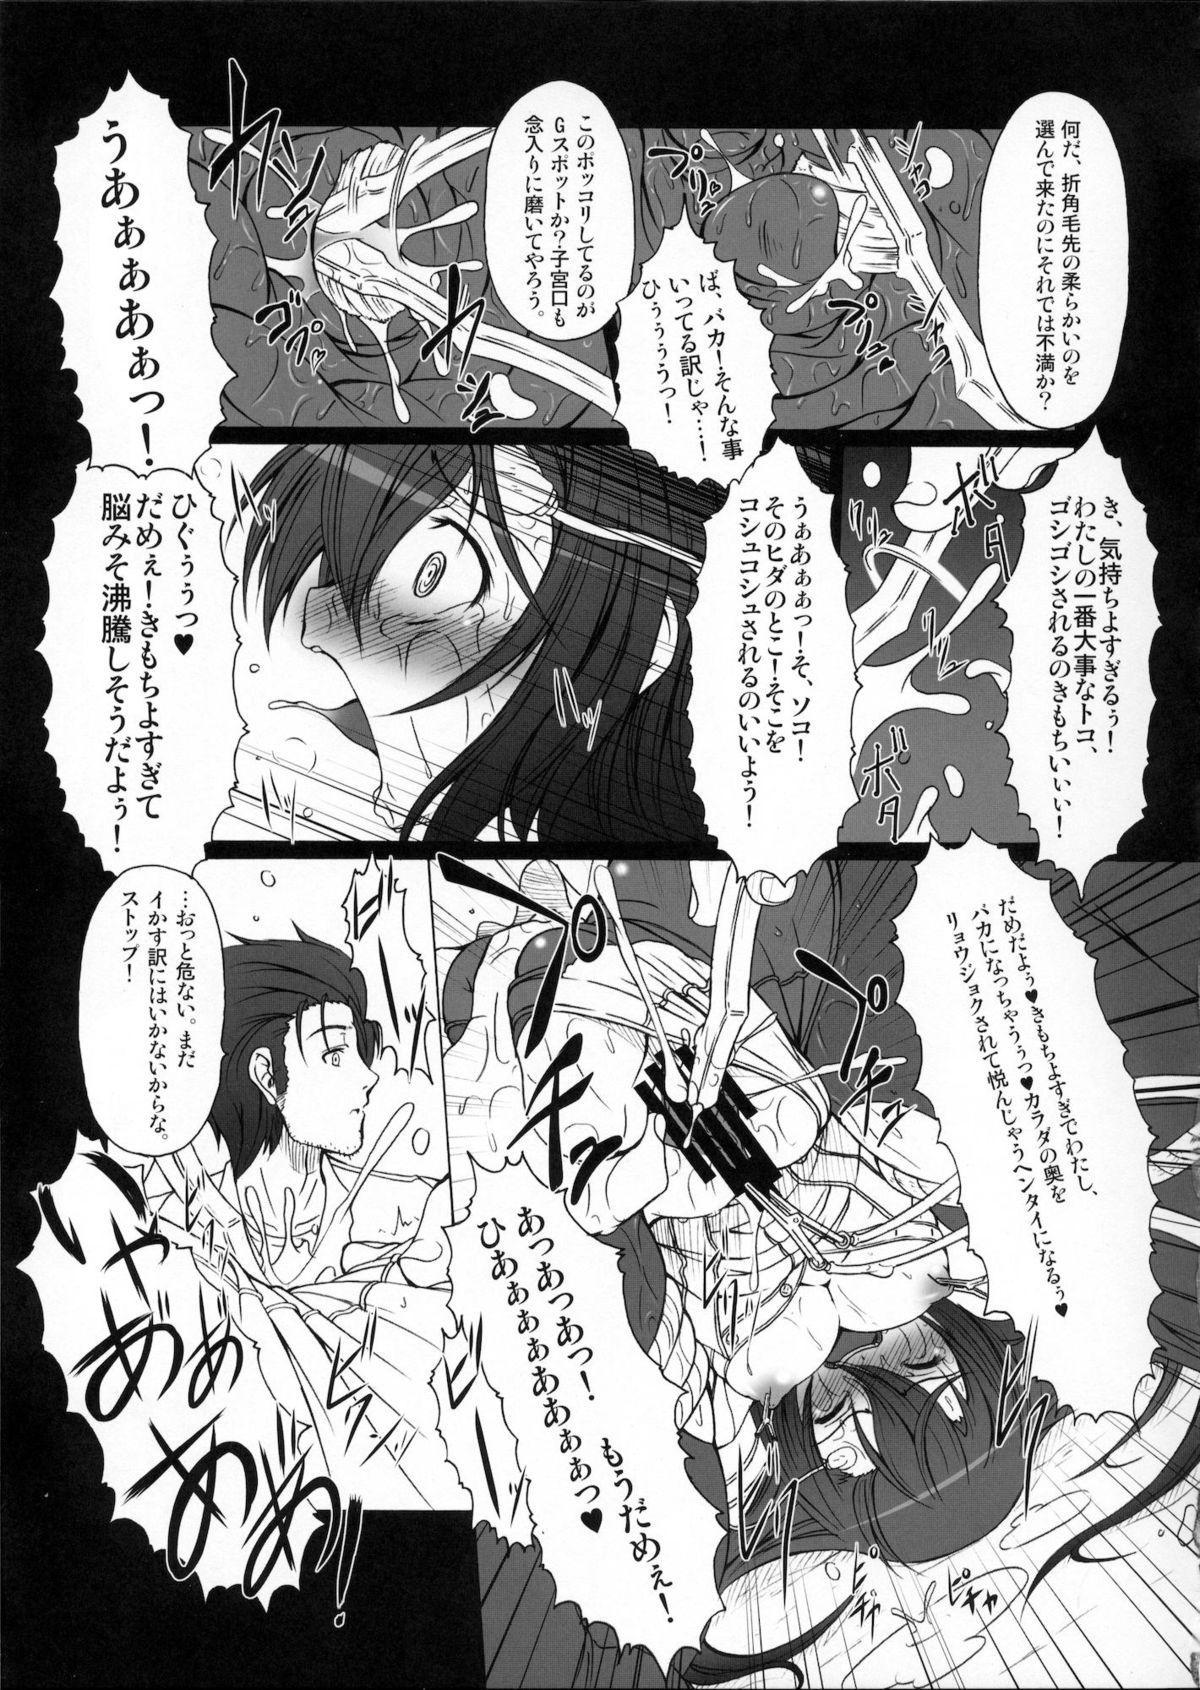 HOBBY'S BLOCK!! 14 Kairaku Tousaku no Ecstasy 17